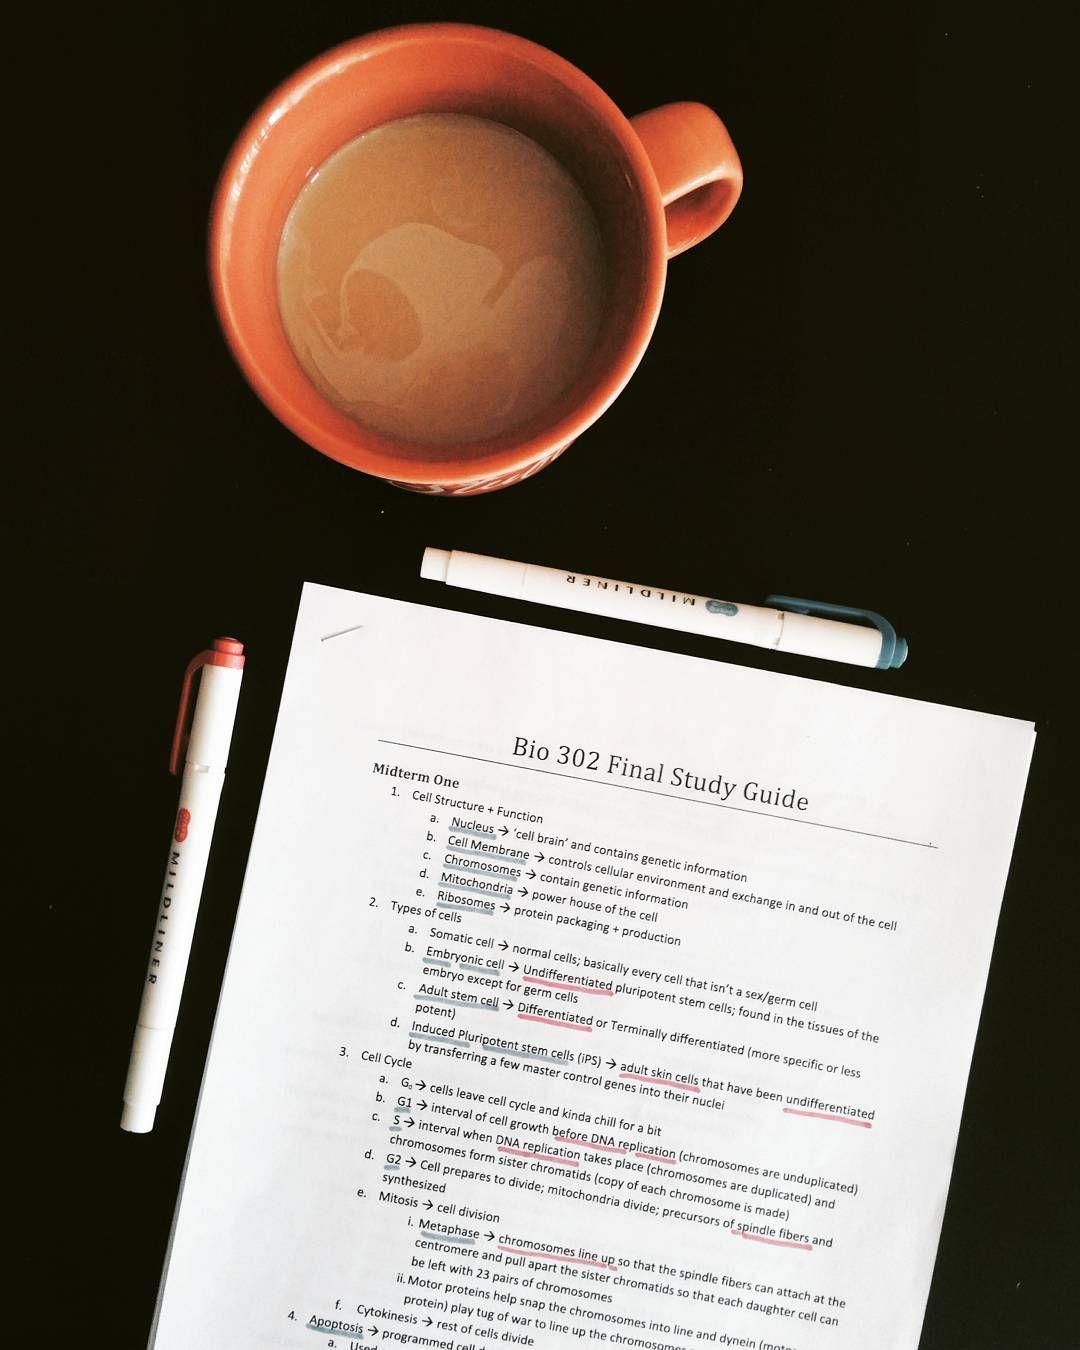 ✨Pinterest✨: @baddiebecky21| Bex ♎️ | | STUDY | Study